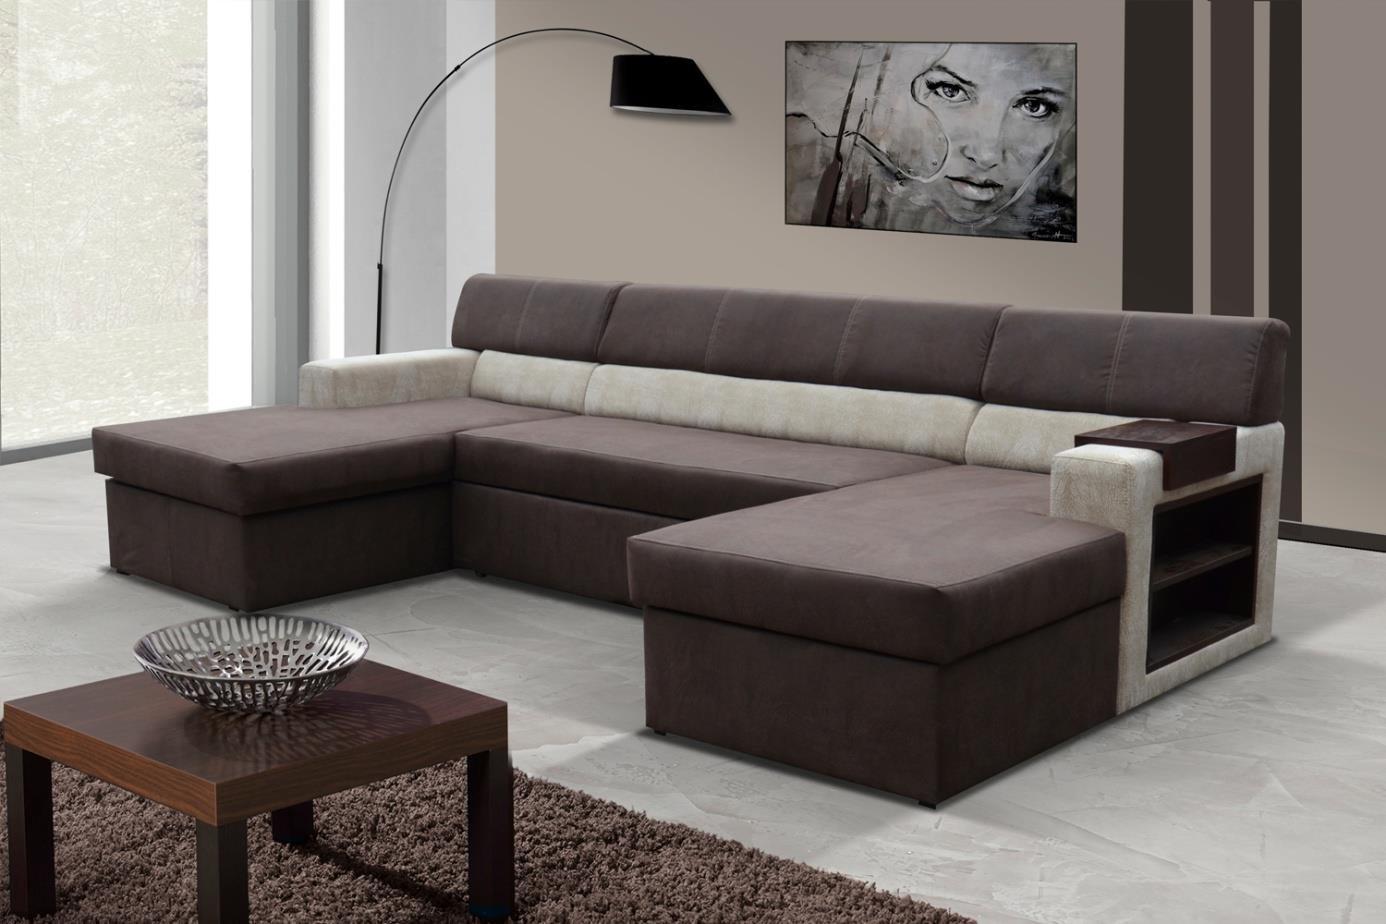 Mobella Saller Amadeus sofá Elegante Salón Paisaje Incluye ...